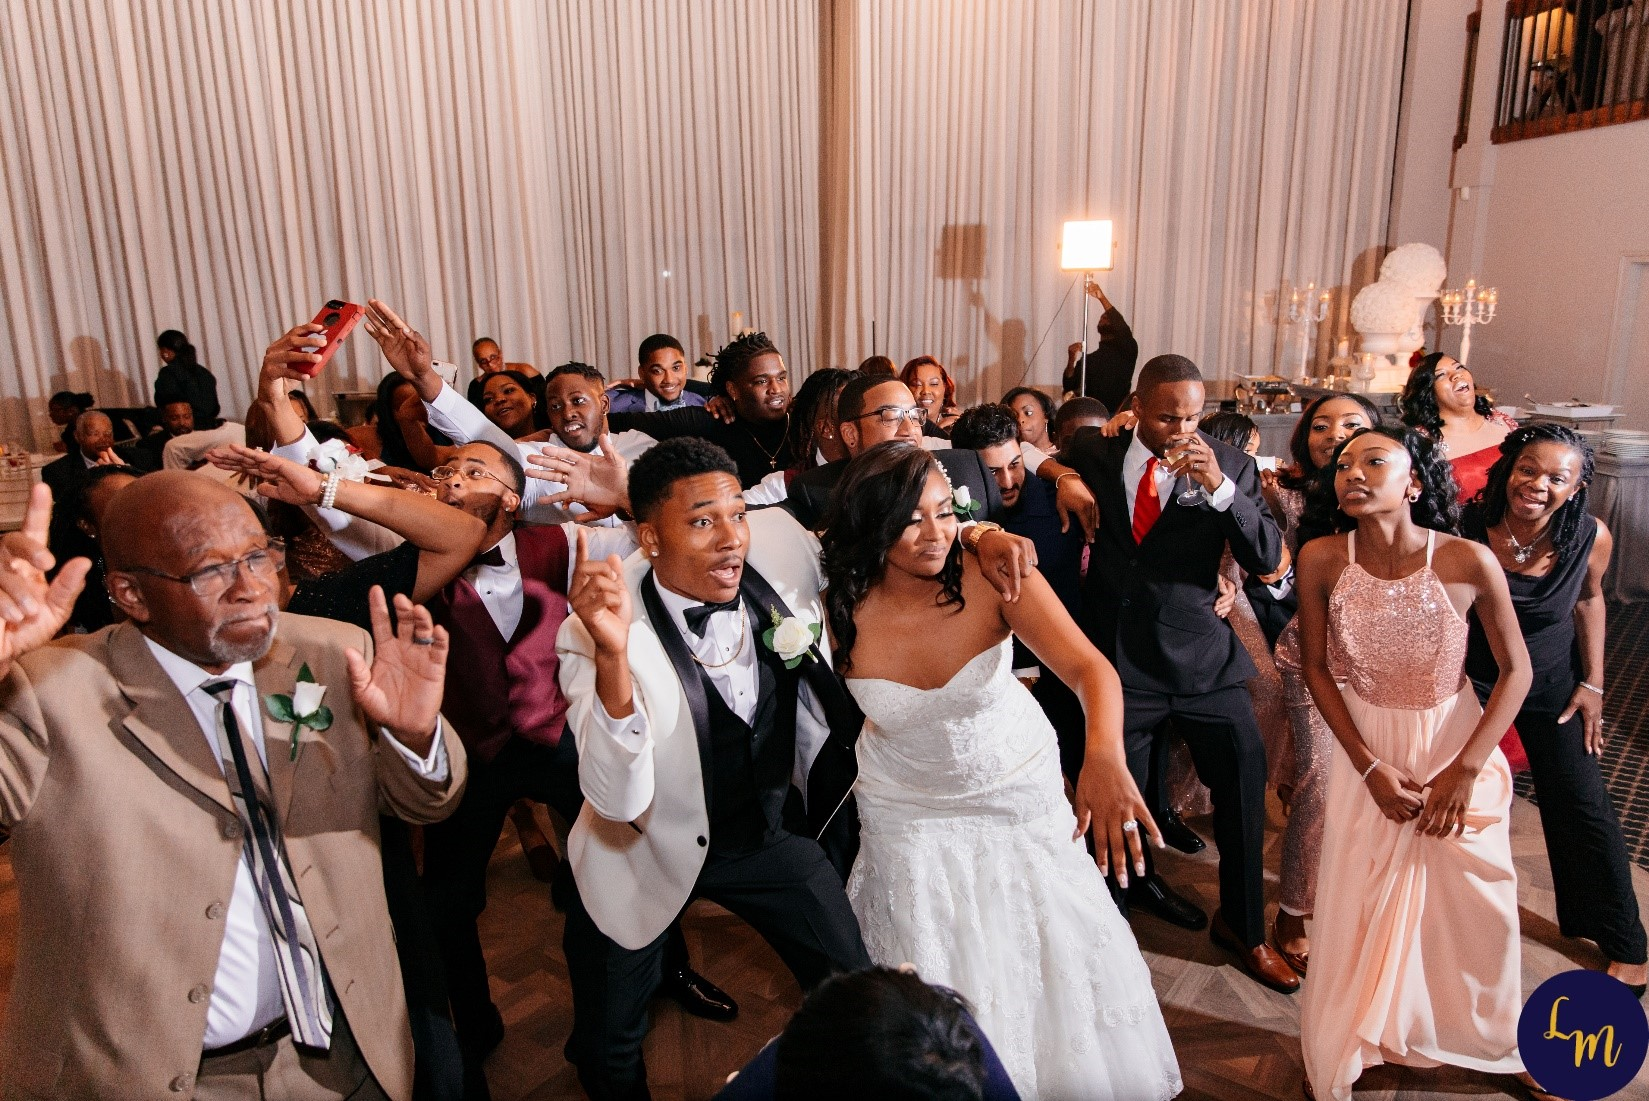 Dancing in Ballroom 2.jpg